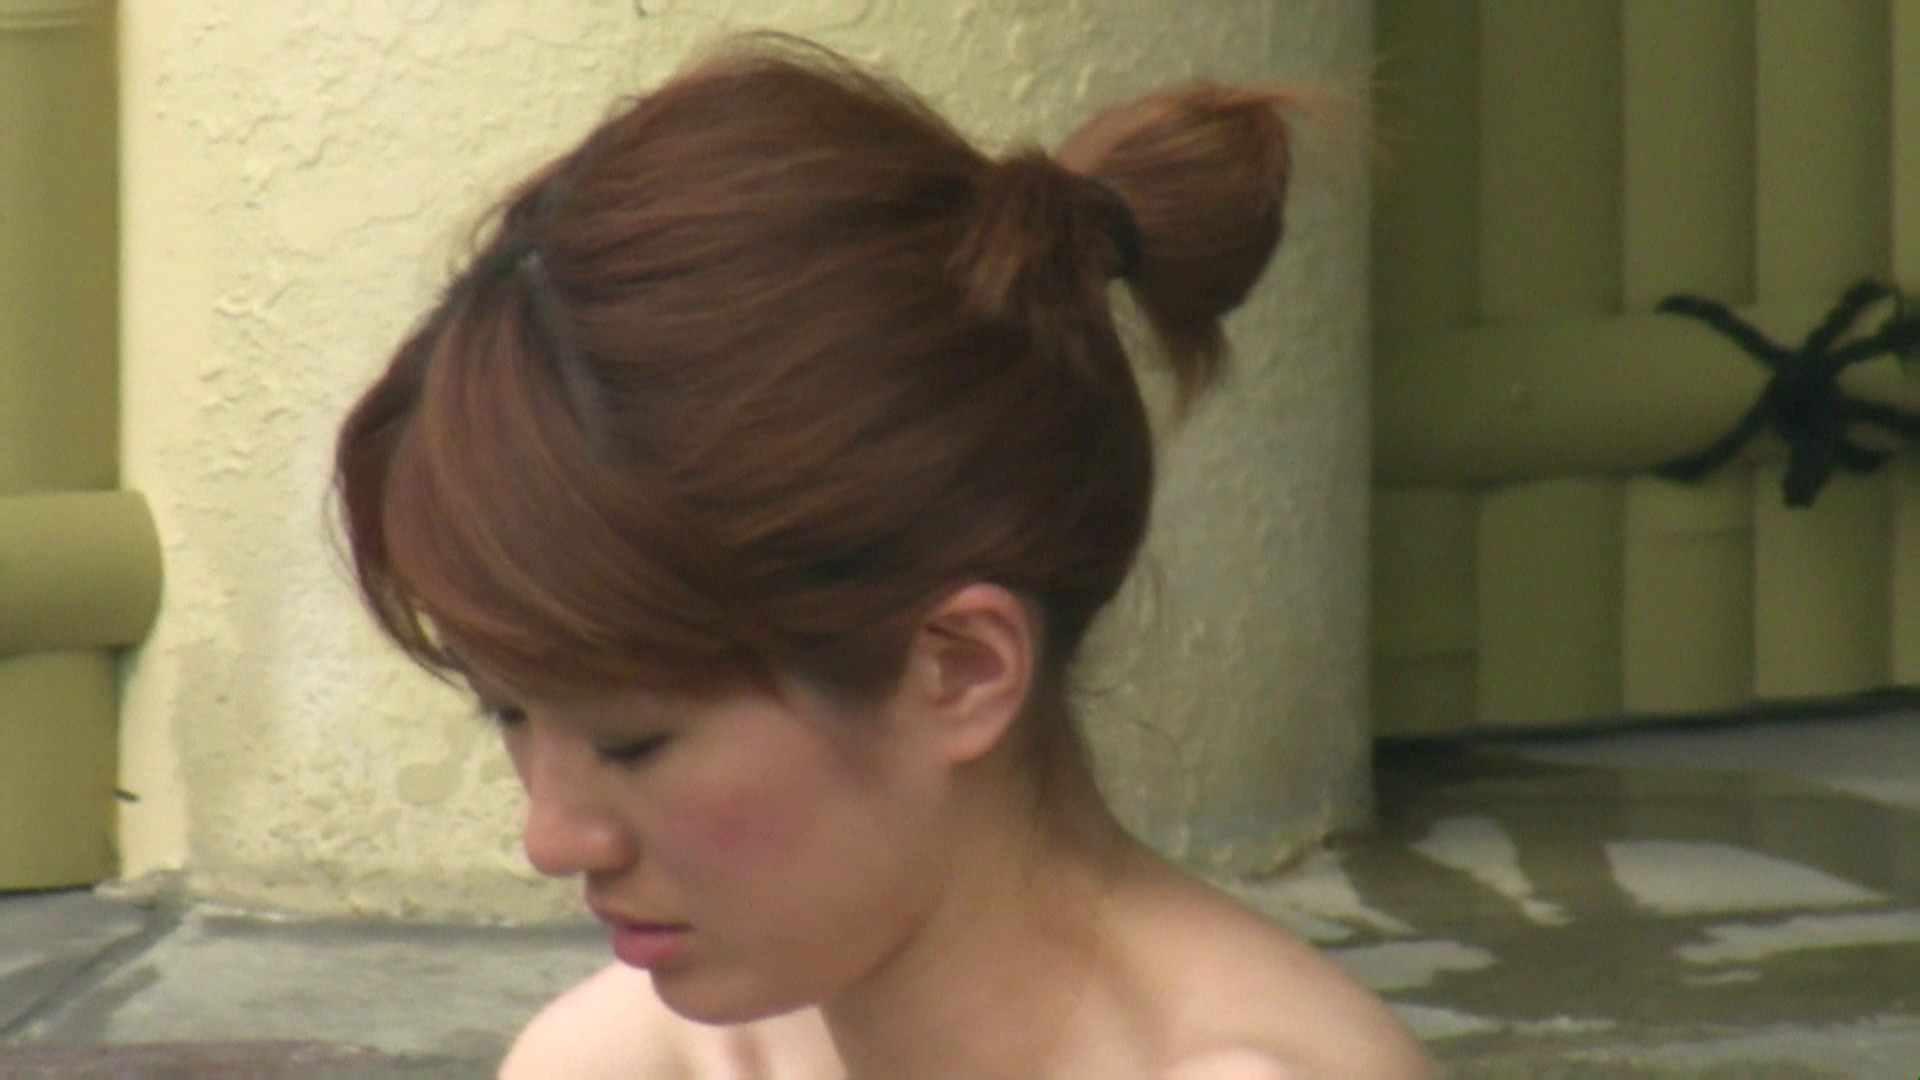 Aquaな露天風呂Vol.110 エッチな盗撮 のぞき動画キャプチャ 89pic 79